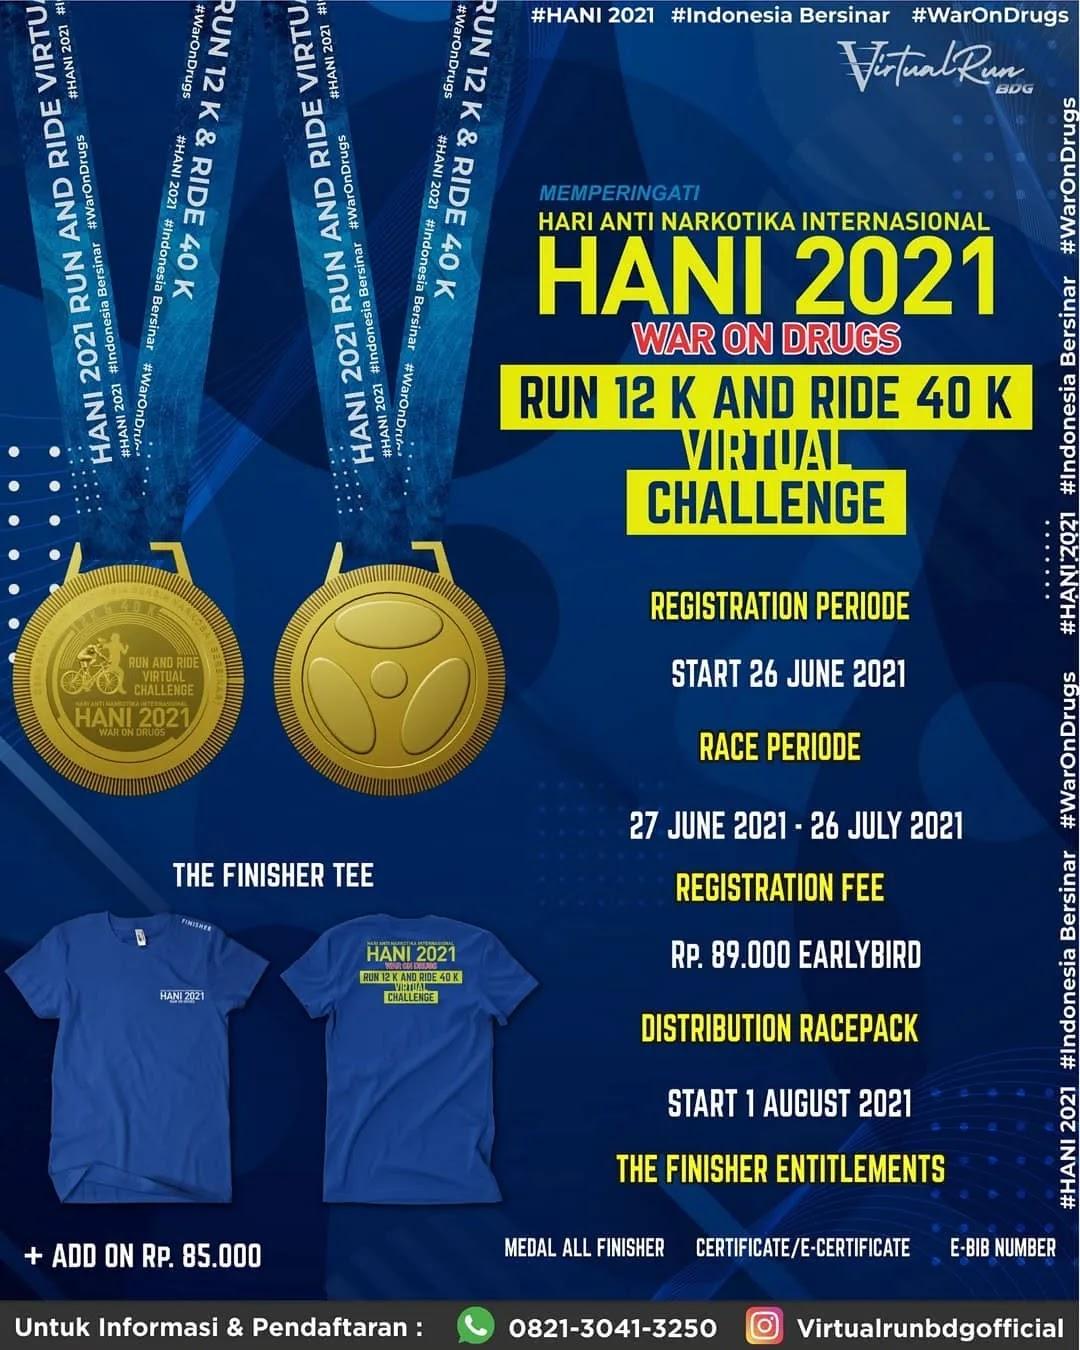 Virtual Run & Ride - Hari Anti Narkotika Internasional • 2021